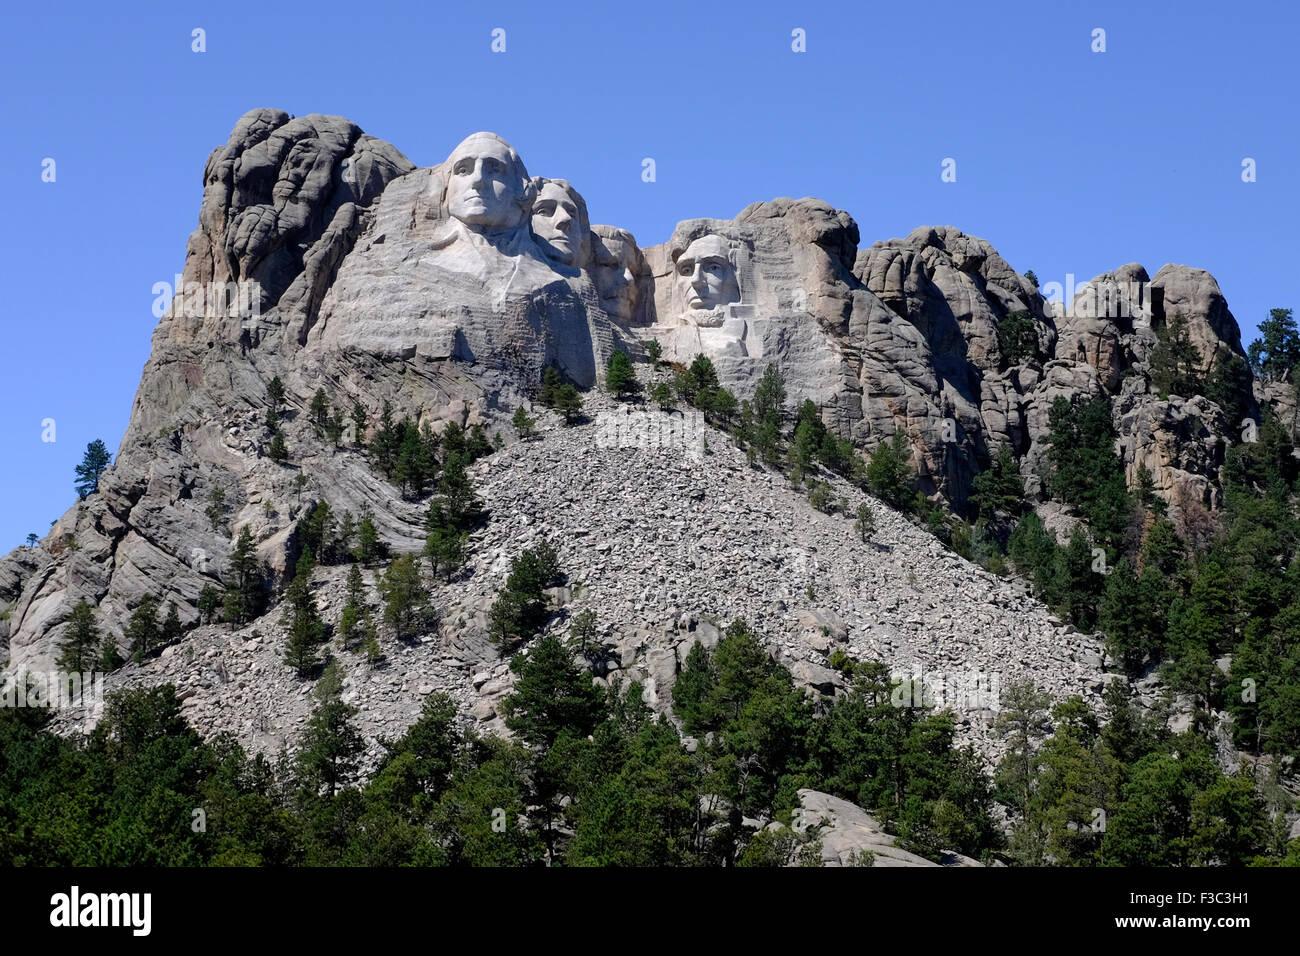 Mount Rushmore National Monument in der Nähe von Keystone, South Dakota Stockbild